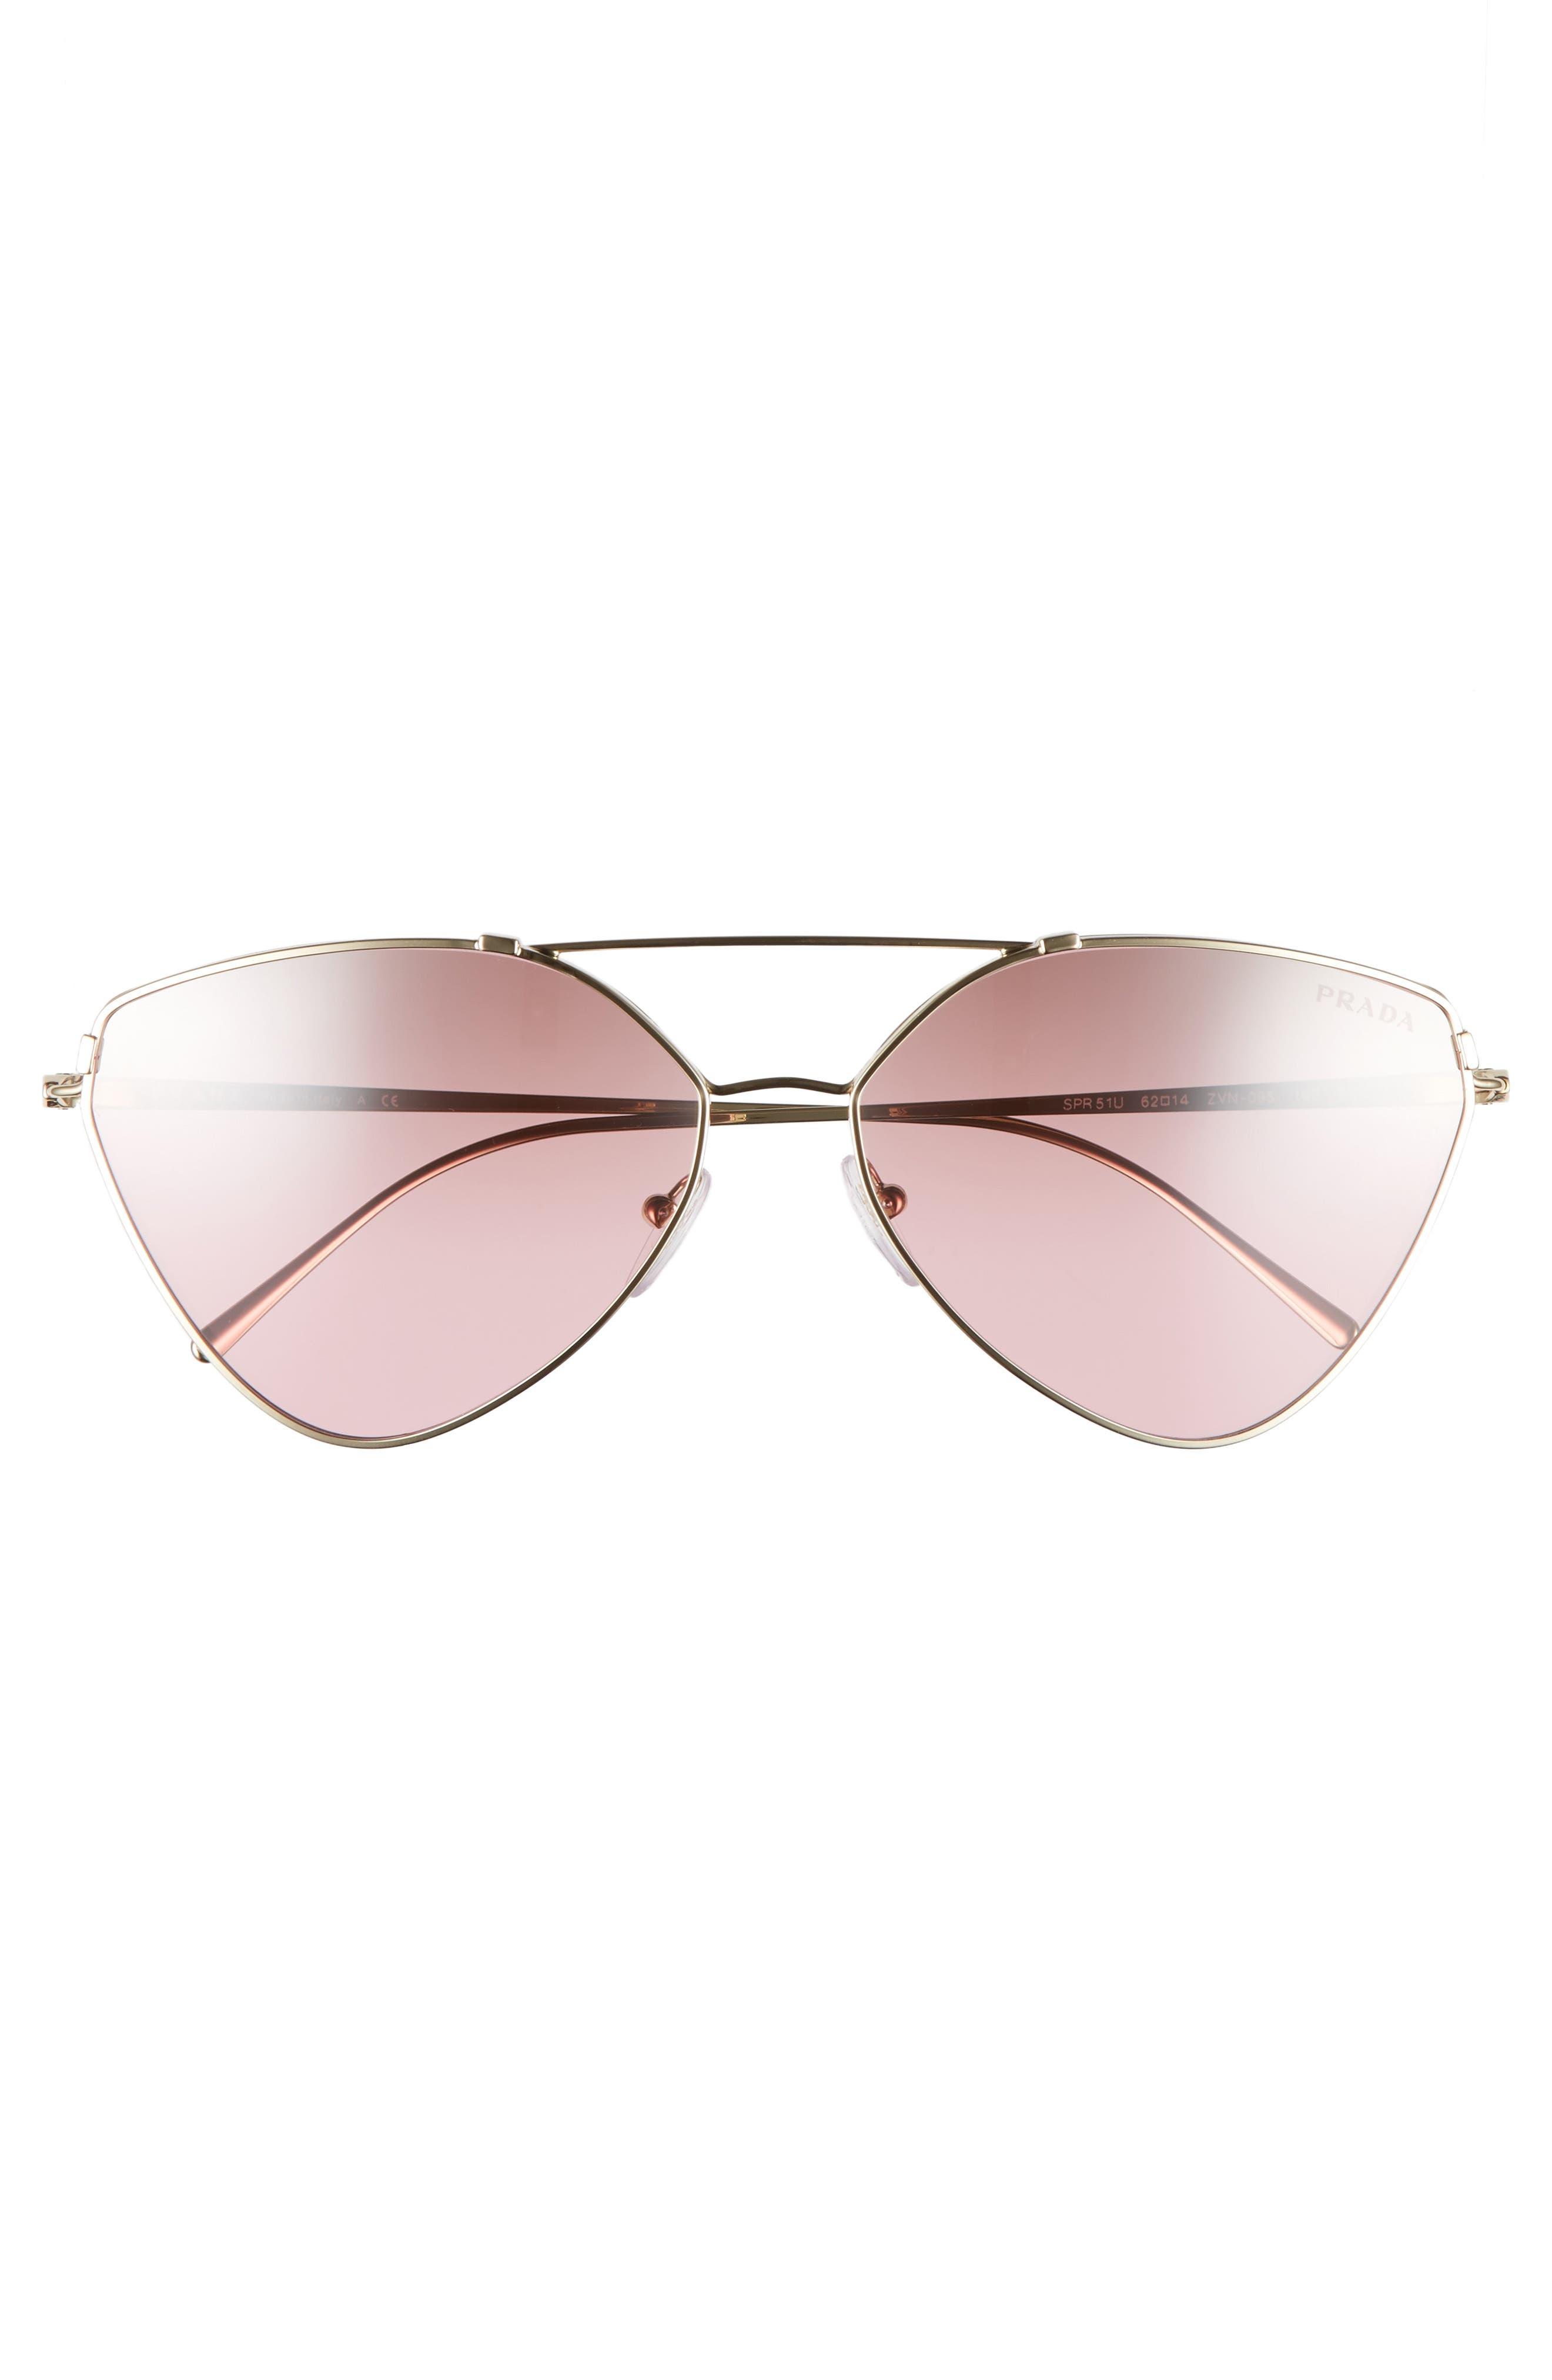 62mm Gradient Aviator Sunglasses,                             Alternate thumbnail 3, color,                             Pale Gold